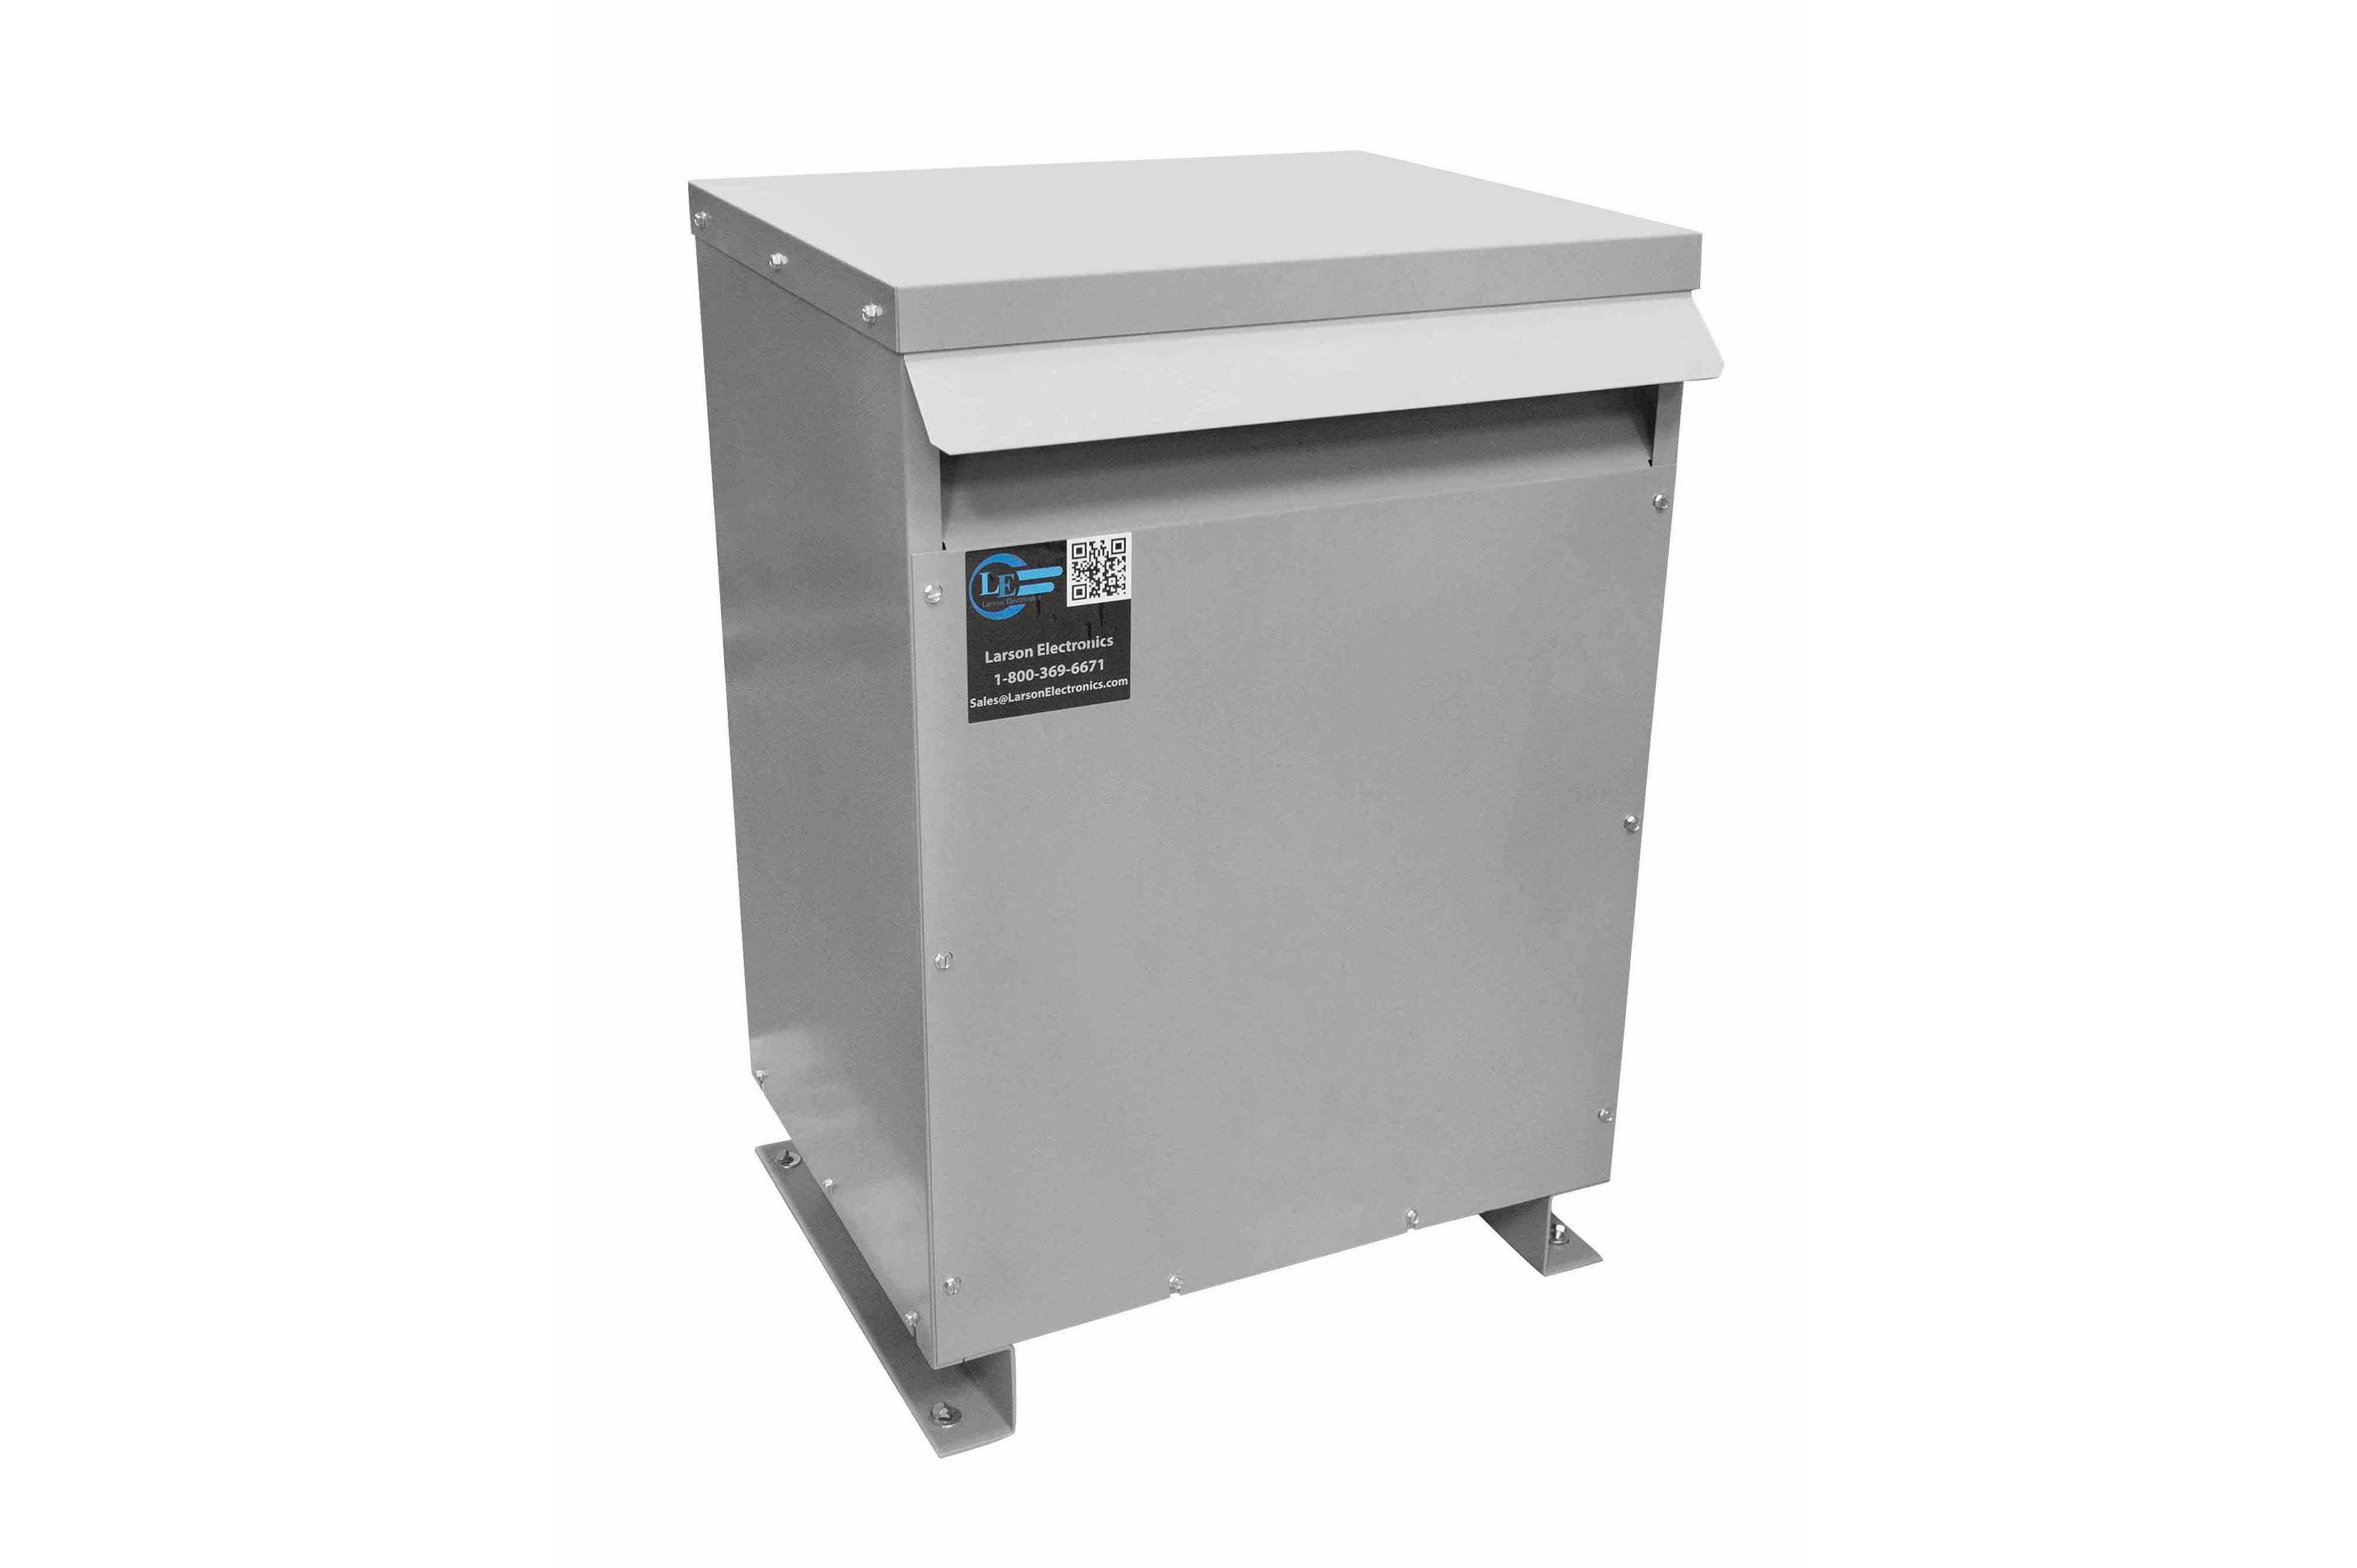 75 kVA 3PH Isolation Transformer, 208V Wye Primary, 415V Delta Secondary, N3R, Ventilated, 60 Hz